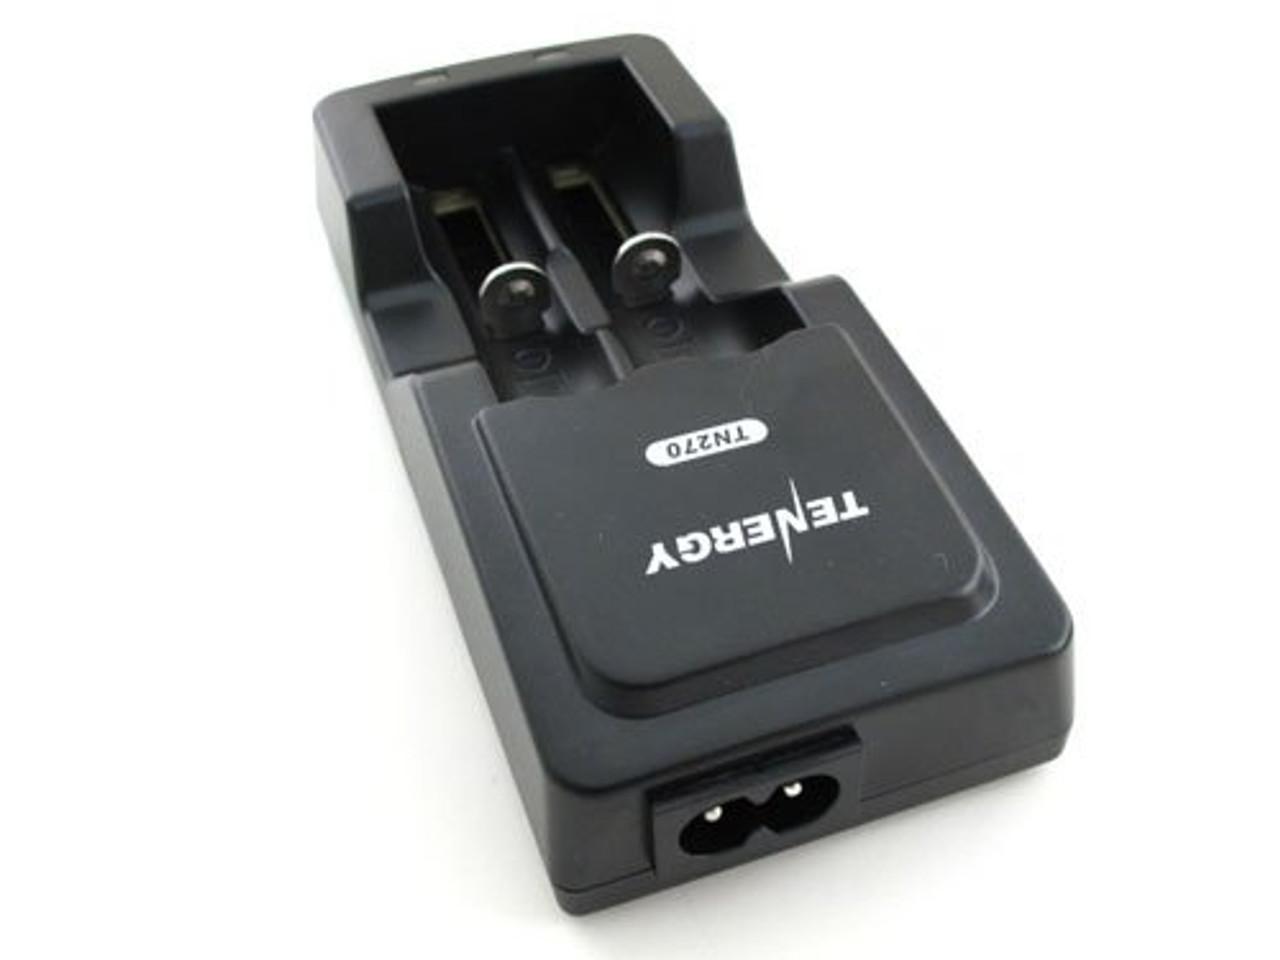 Card: Tenergy TN270 Li-ion Battery Charger + 2 Li-ion 18650 3.7V 2600mAh Button Top Battery w/ PCB (w/ Car Plug)